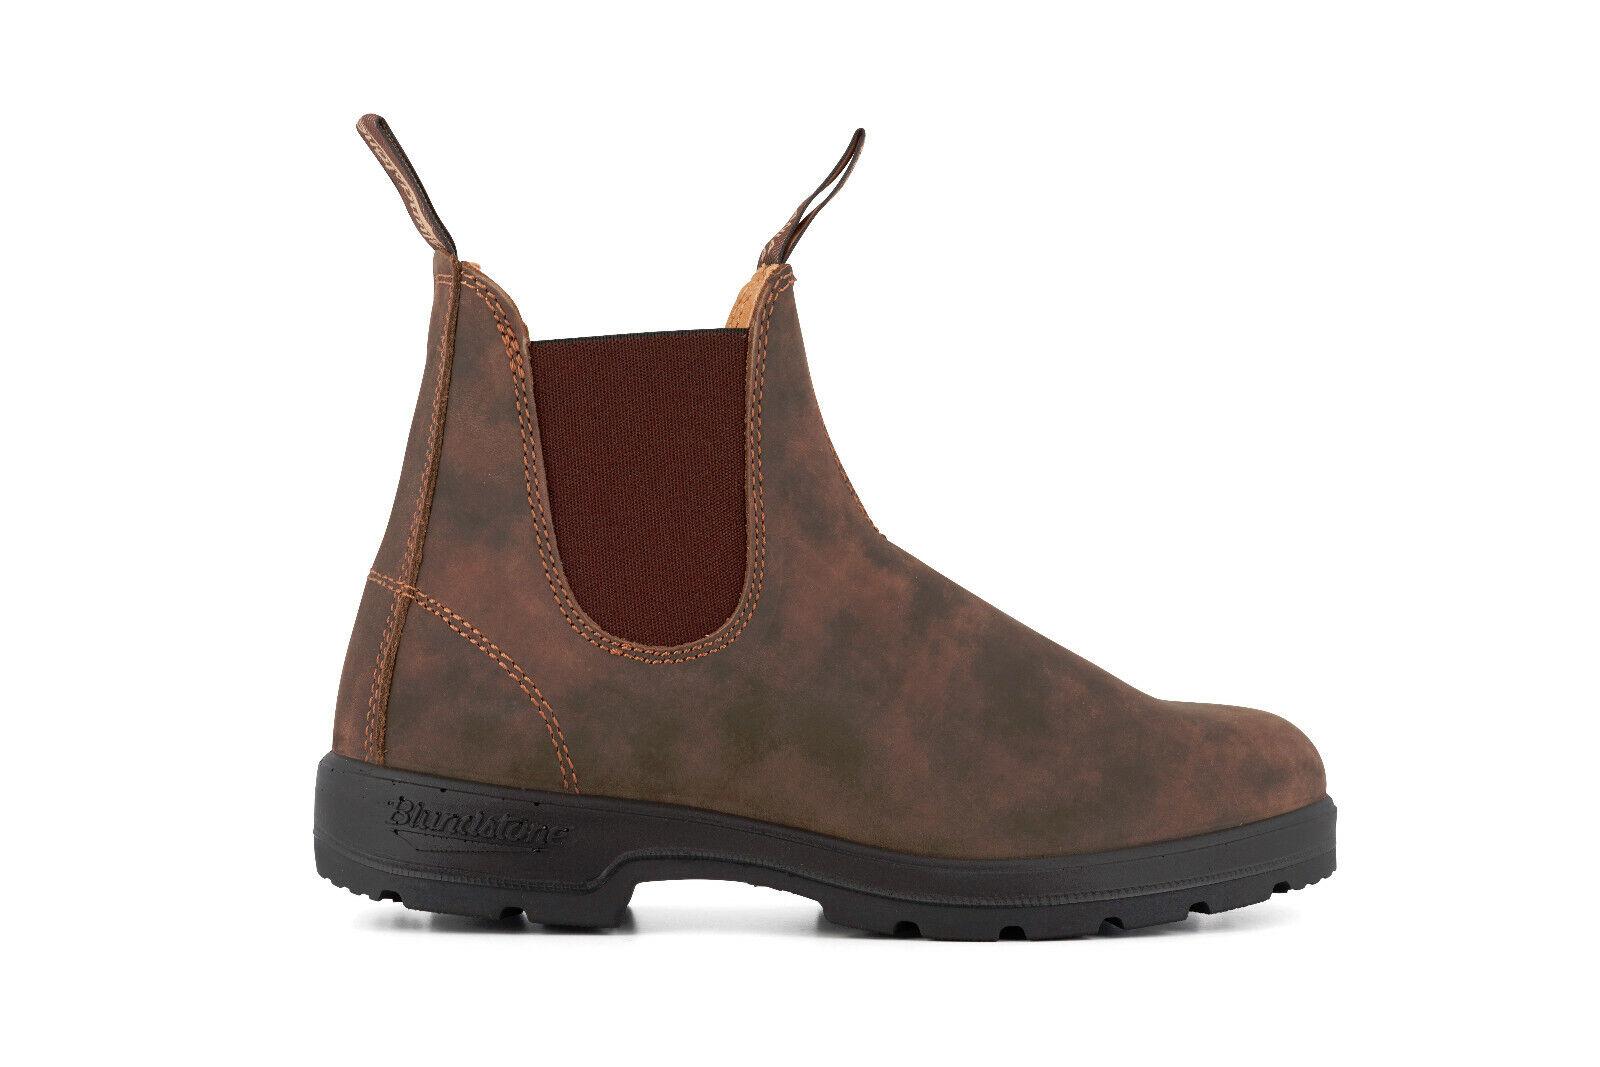 Blaundstone Style 585 Rustikal Braun Nubuk Leder Australisch Chelsea Stiefel